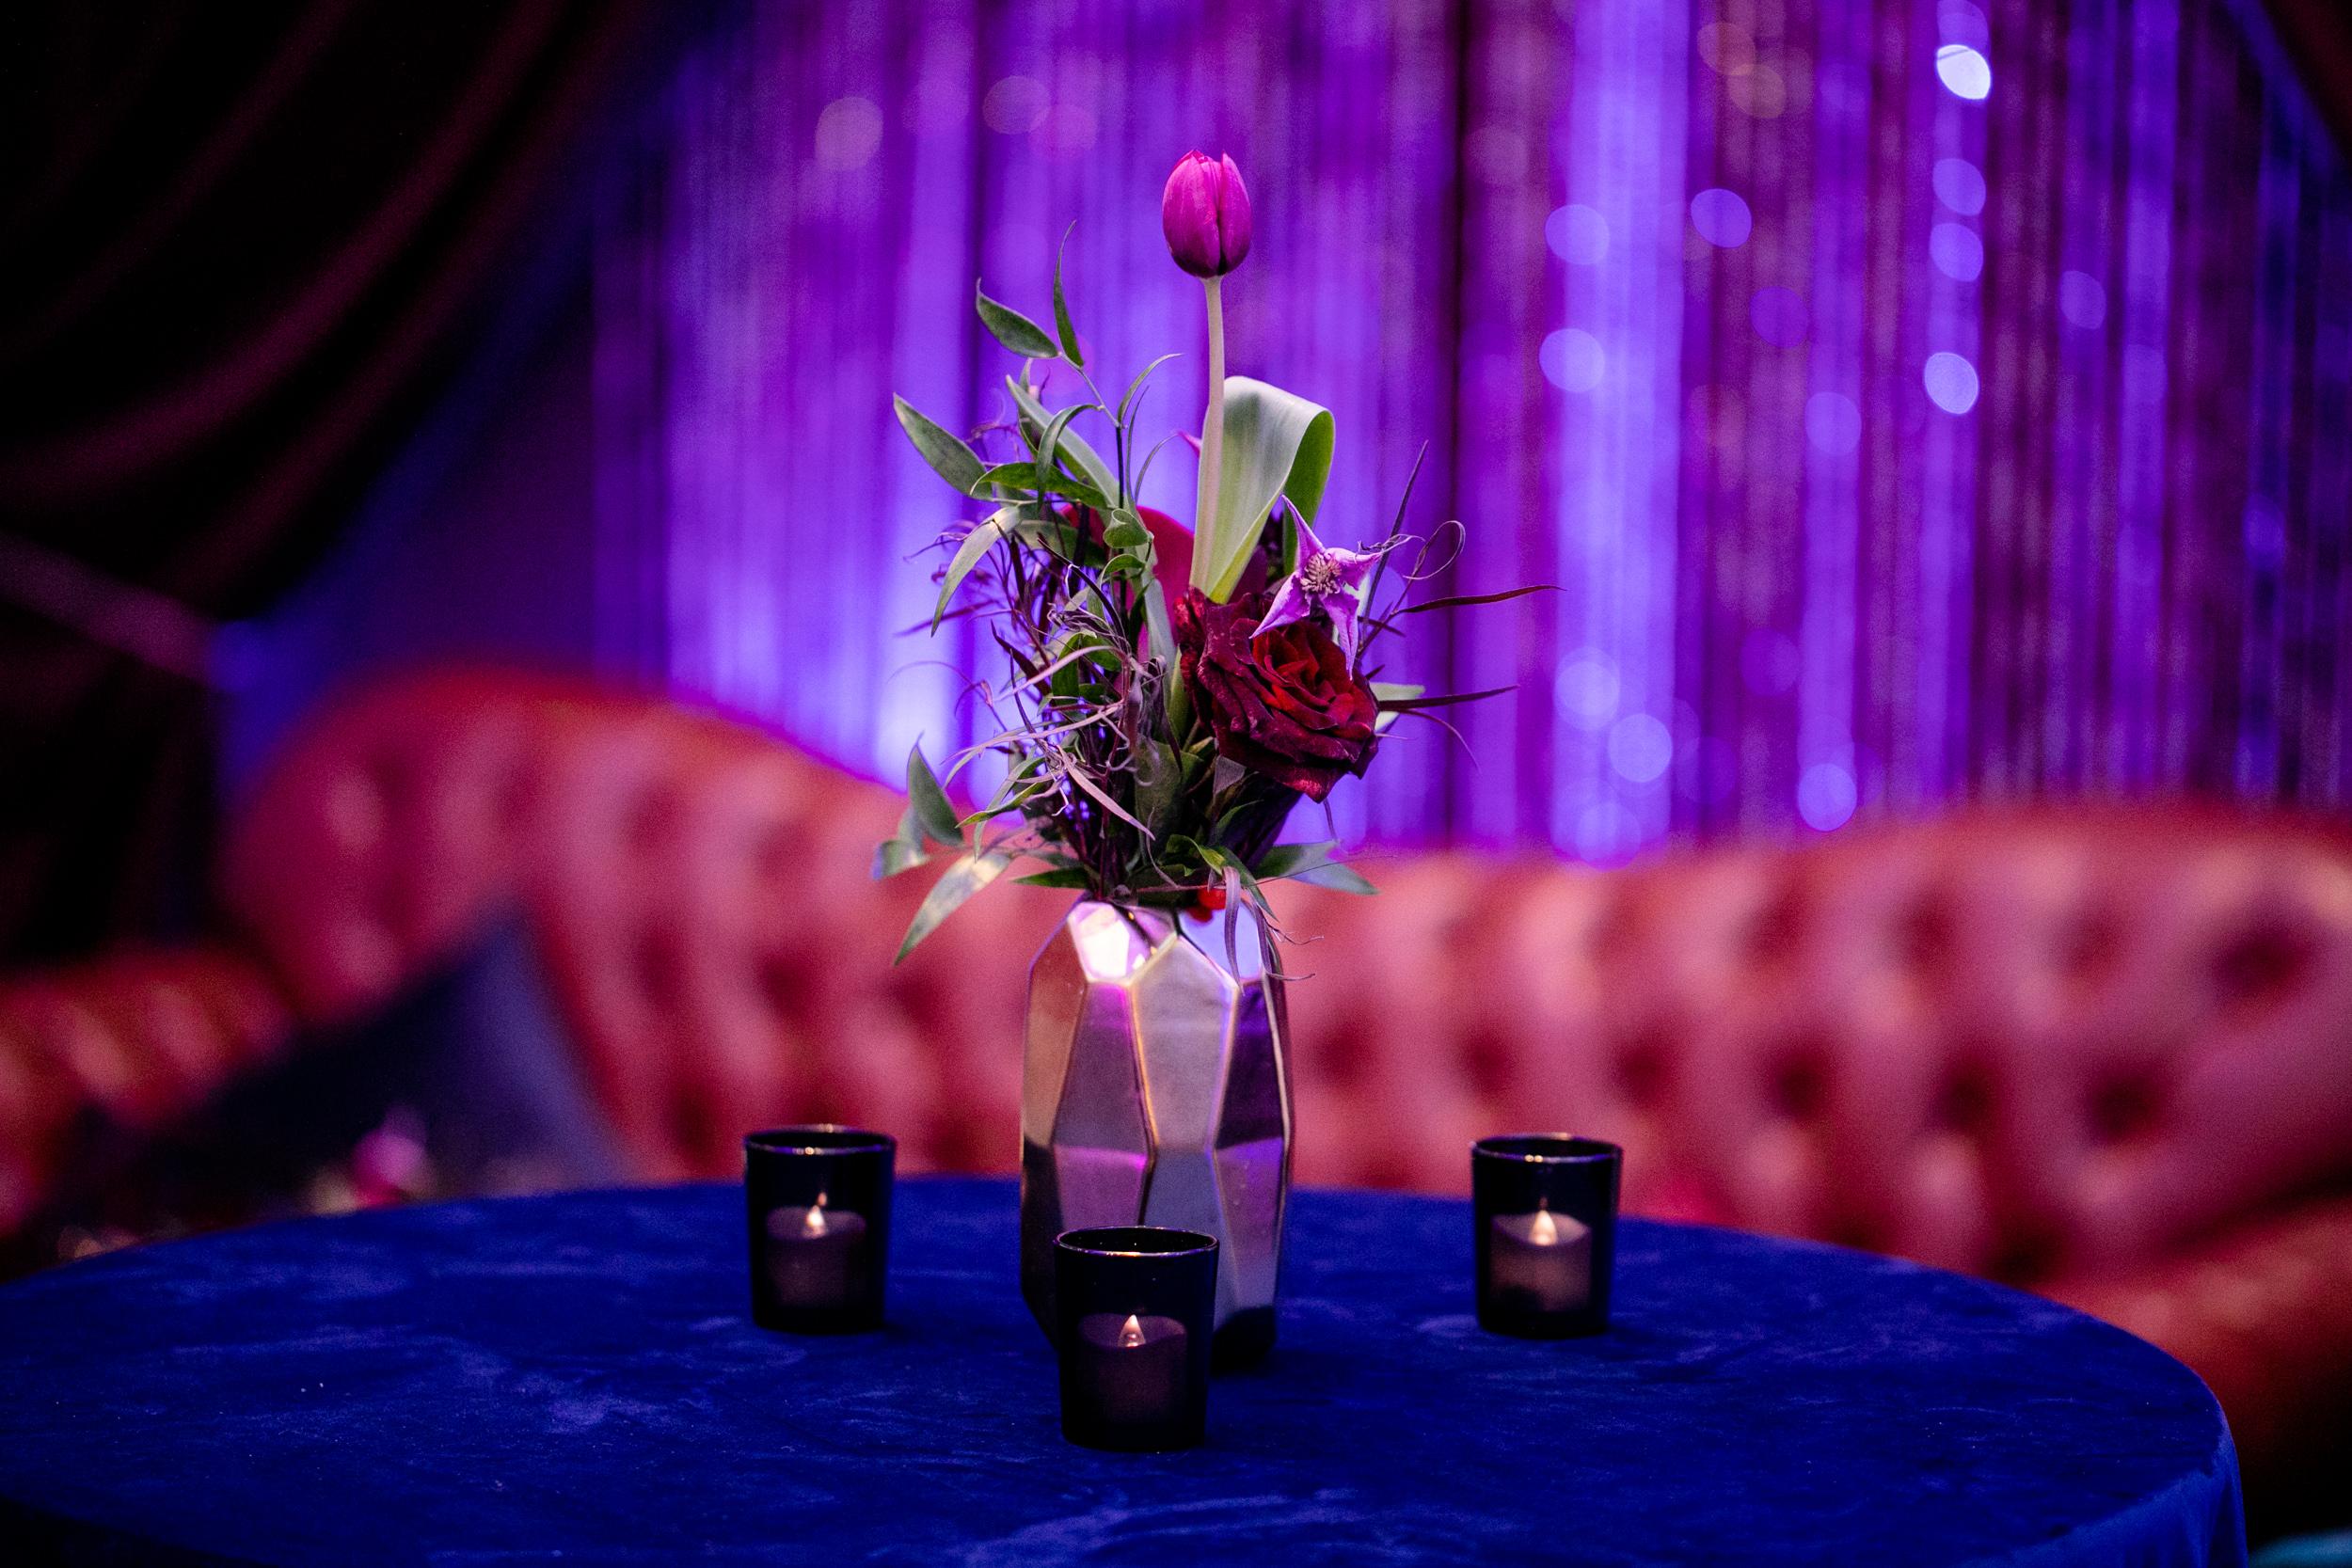 Masquerade_Ball_Currier_Museum_Manchester_Malloy_Events_floral_lighting_backdrop_drape_arrangement